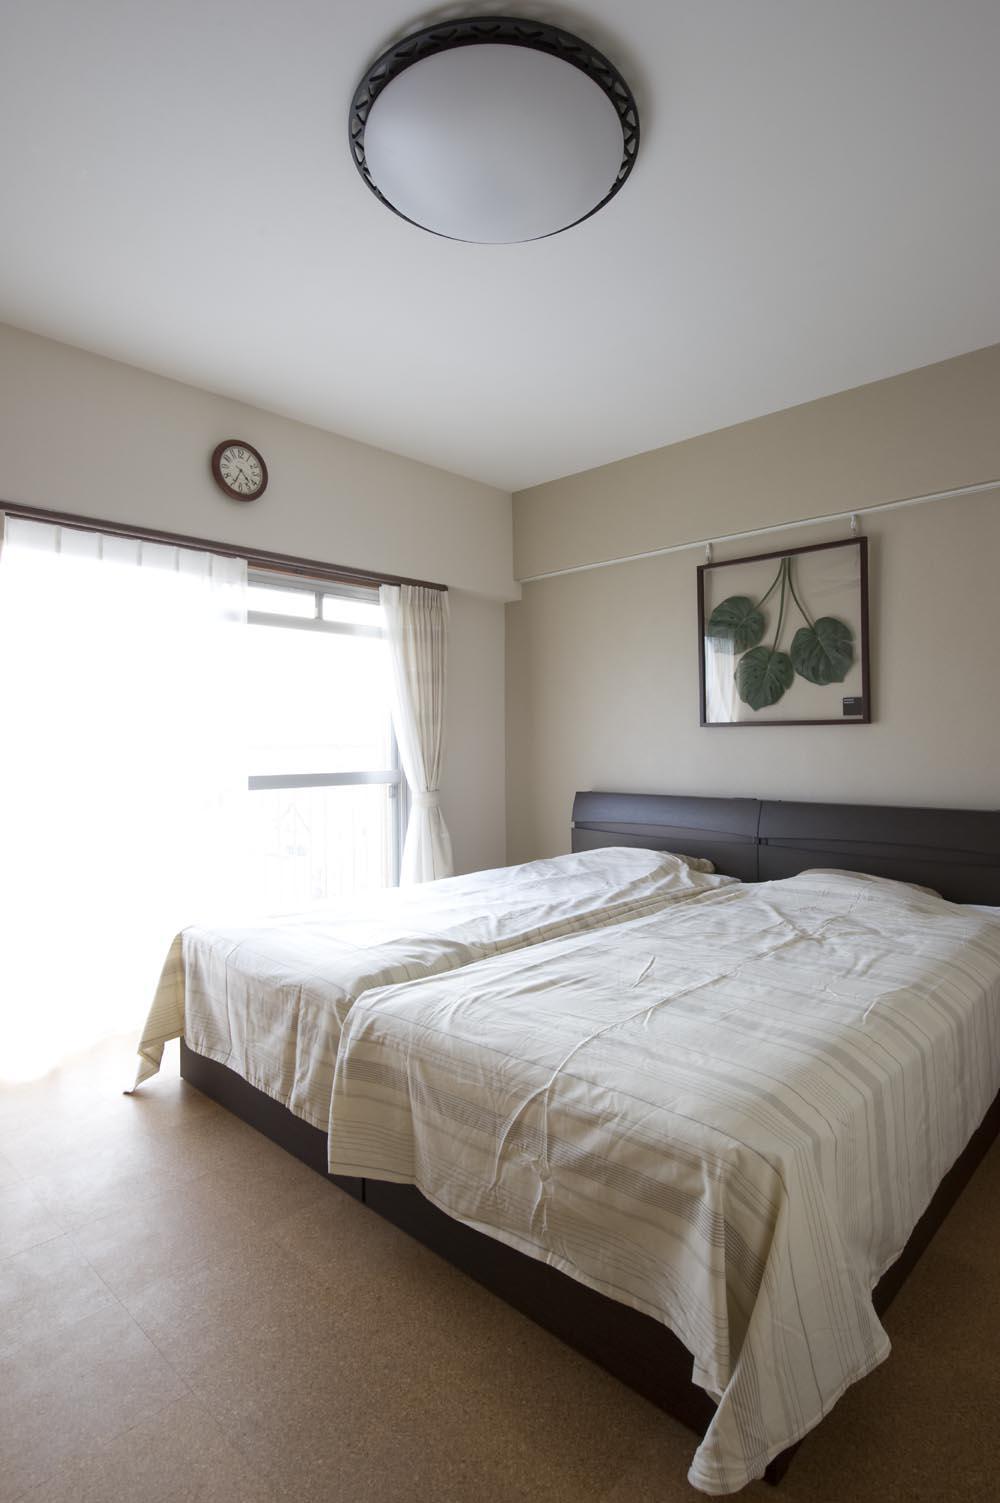 I邸・斜めに配置したキッチンで、動きと変化をの部屋 明るく開放的なベッドルーム